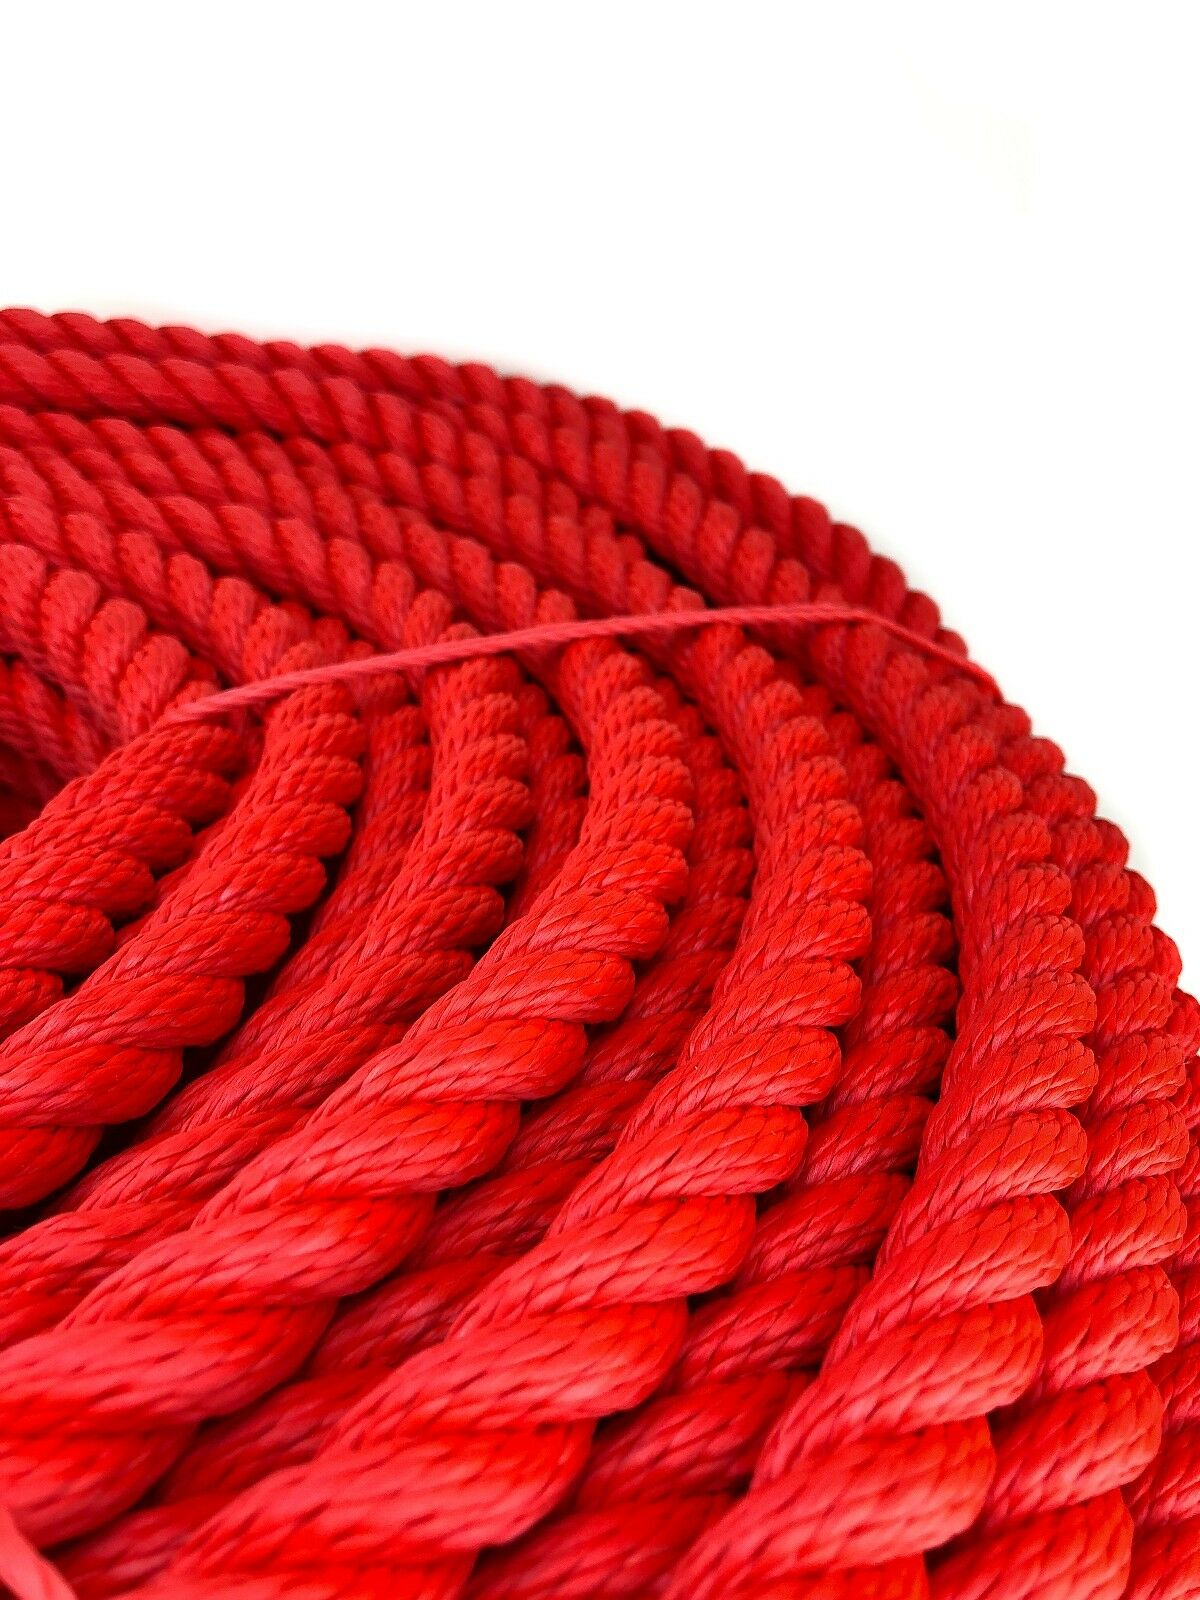 24mm x rot 3-Strang Multifilament x 24mm 20 m (schwimmende Seil) Softline Seil 10eb24